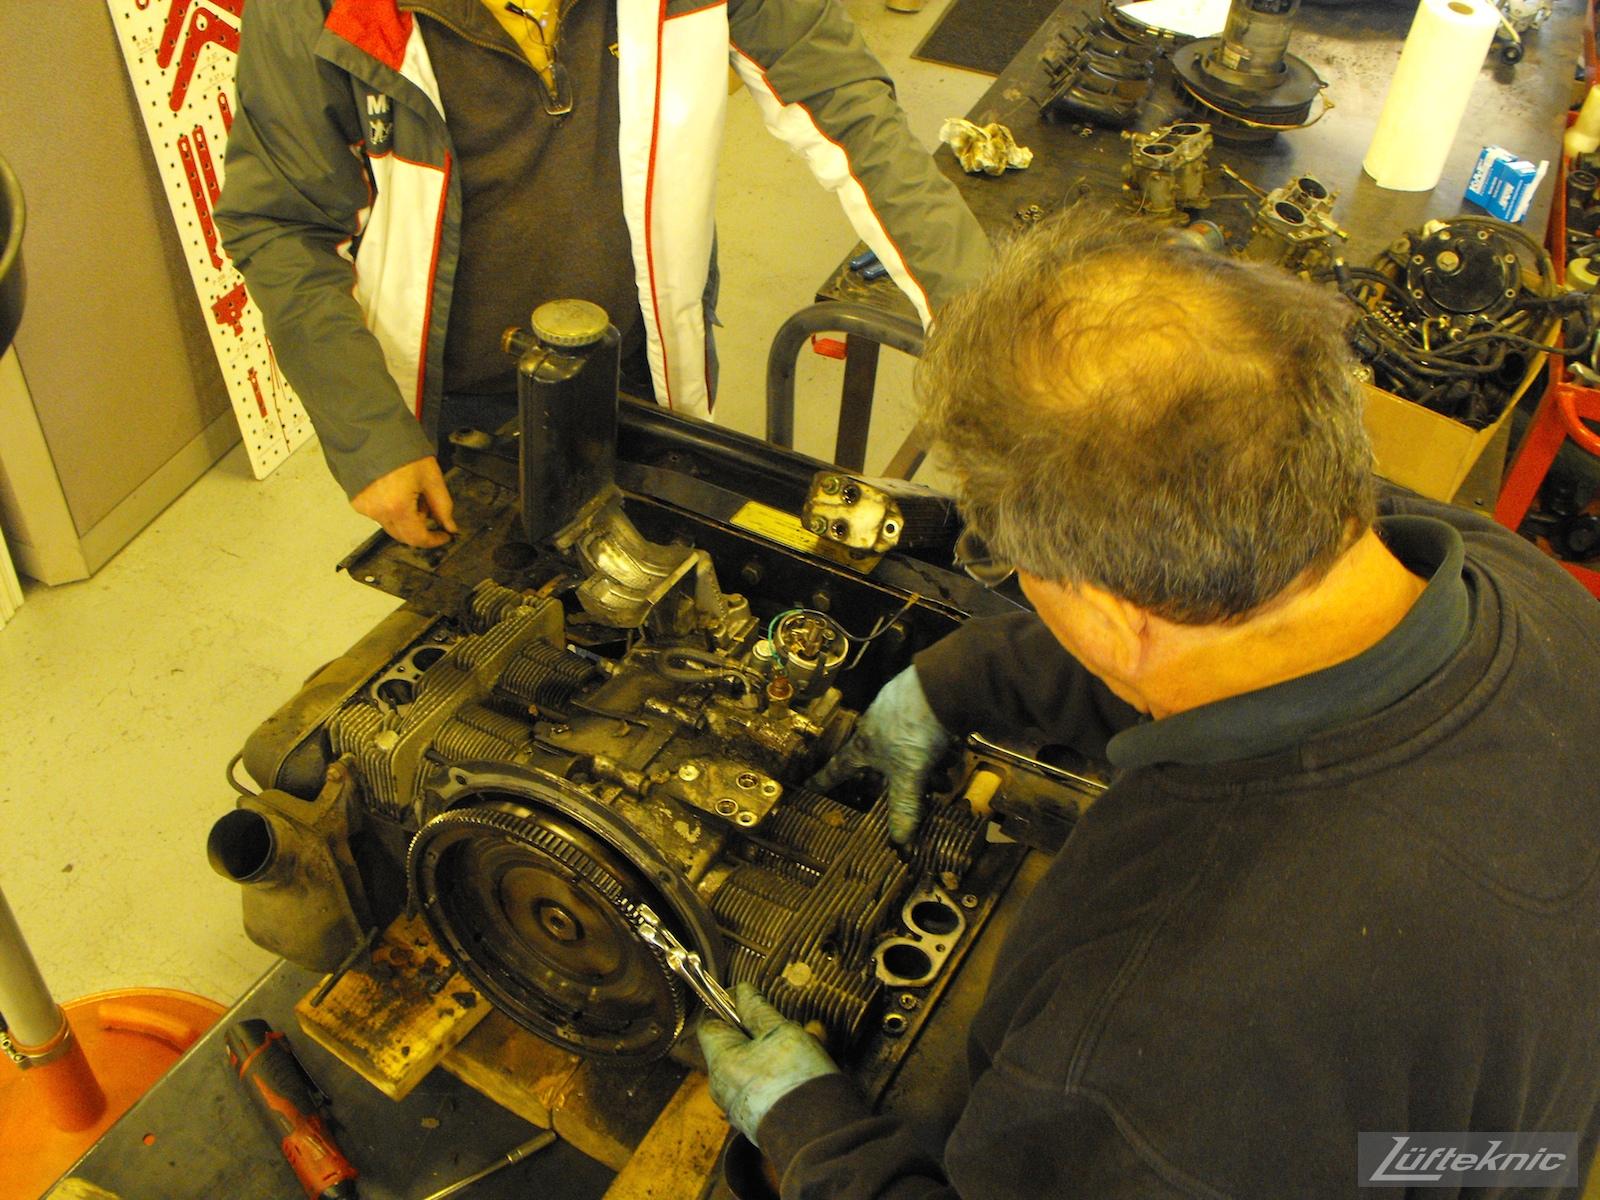 Engine disassembly begins on an Irish Green Porsche 912 undergoing restoration at Lufteknic.